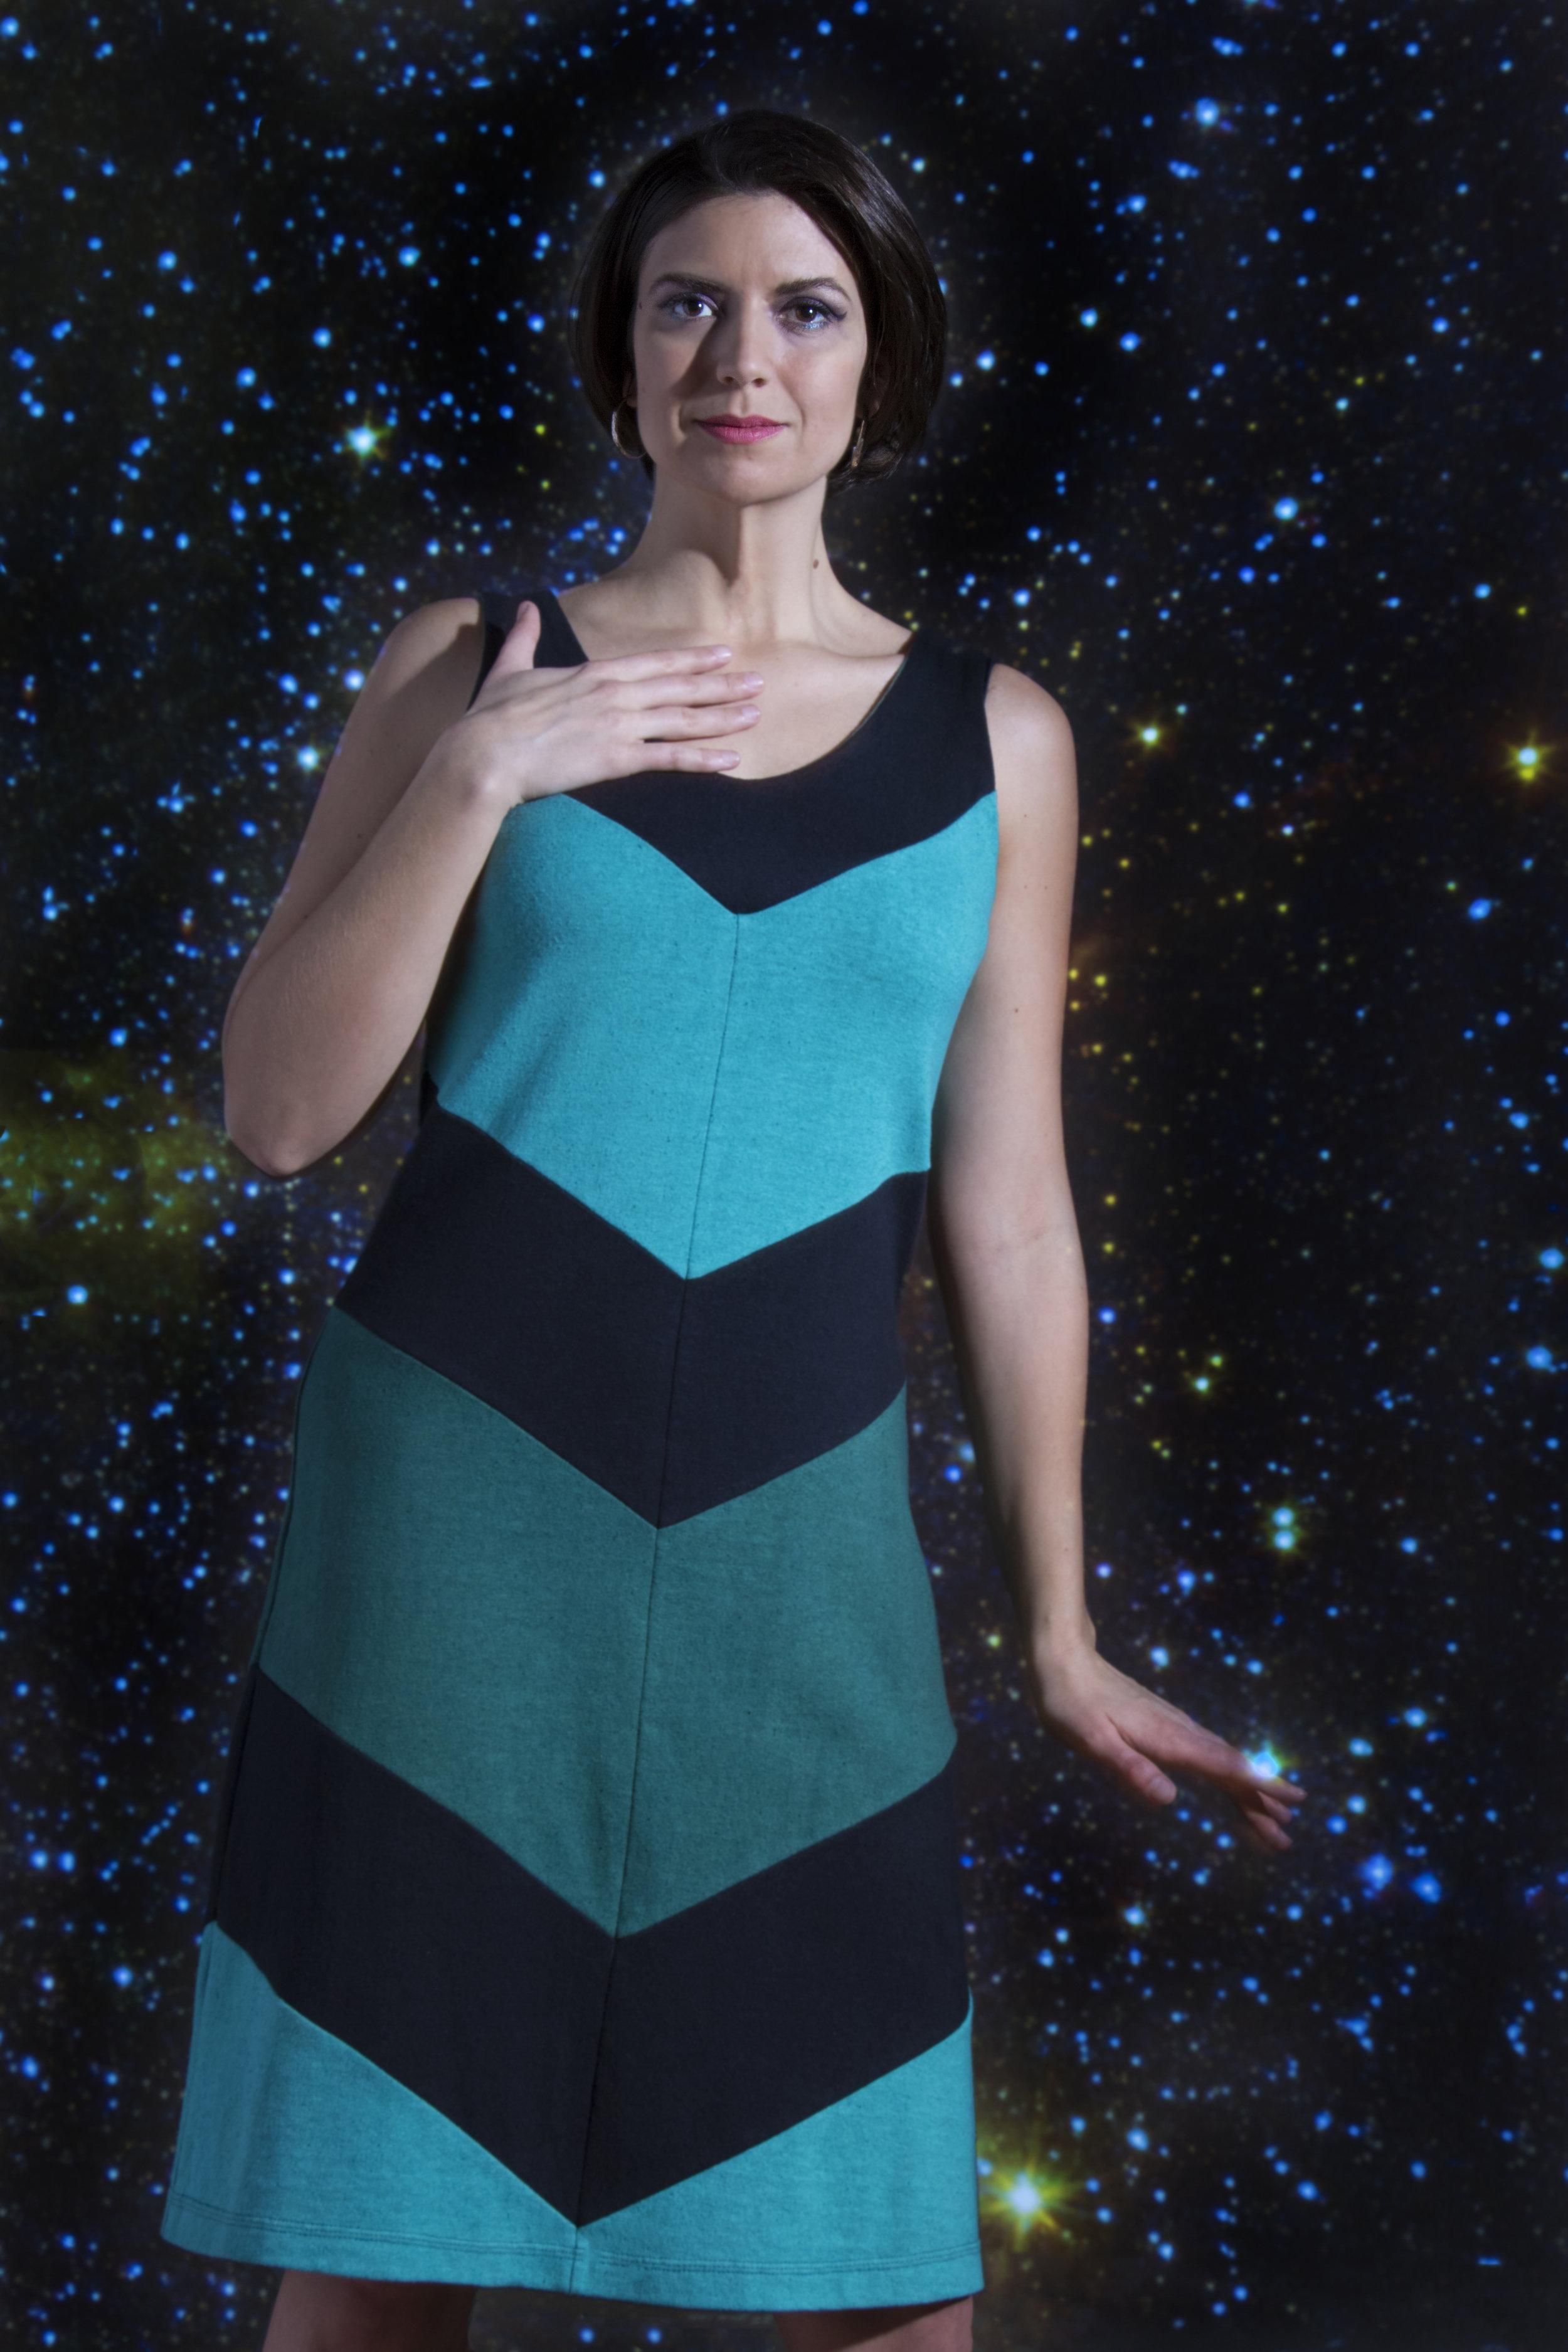 Super Nova Dress in the Stars